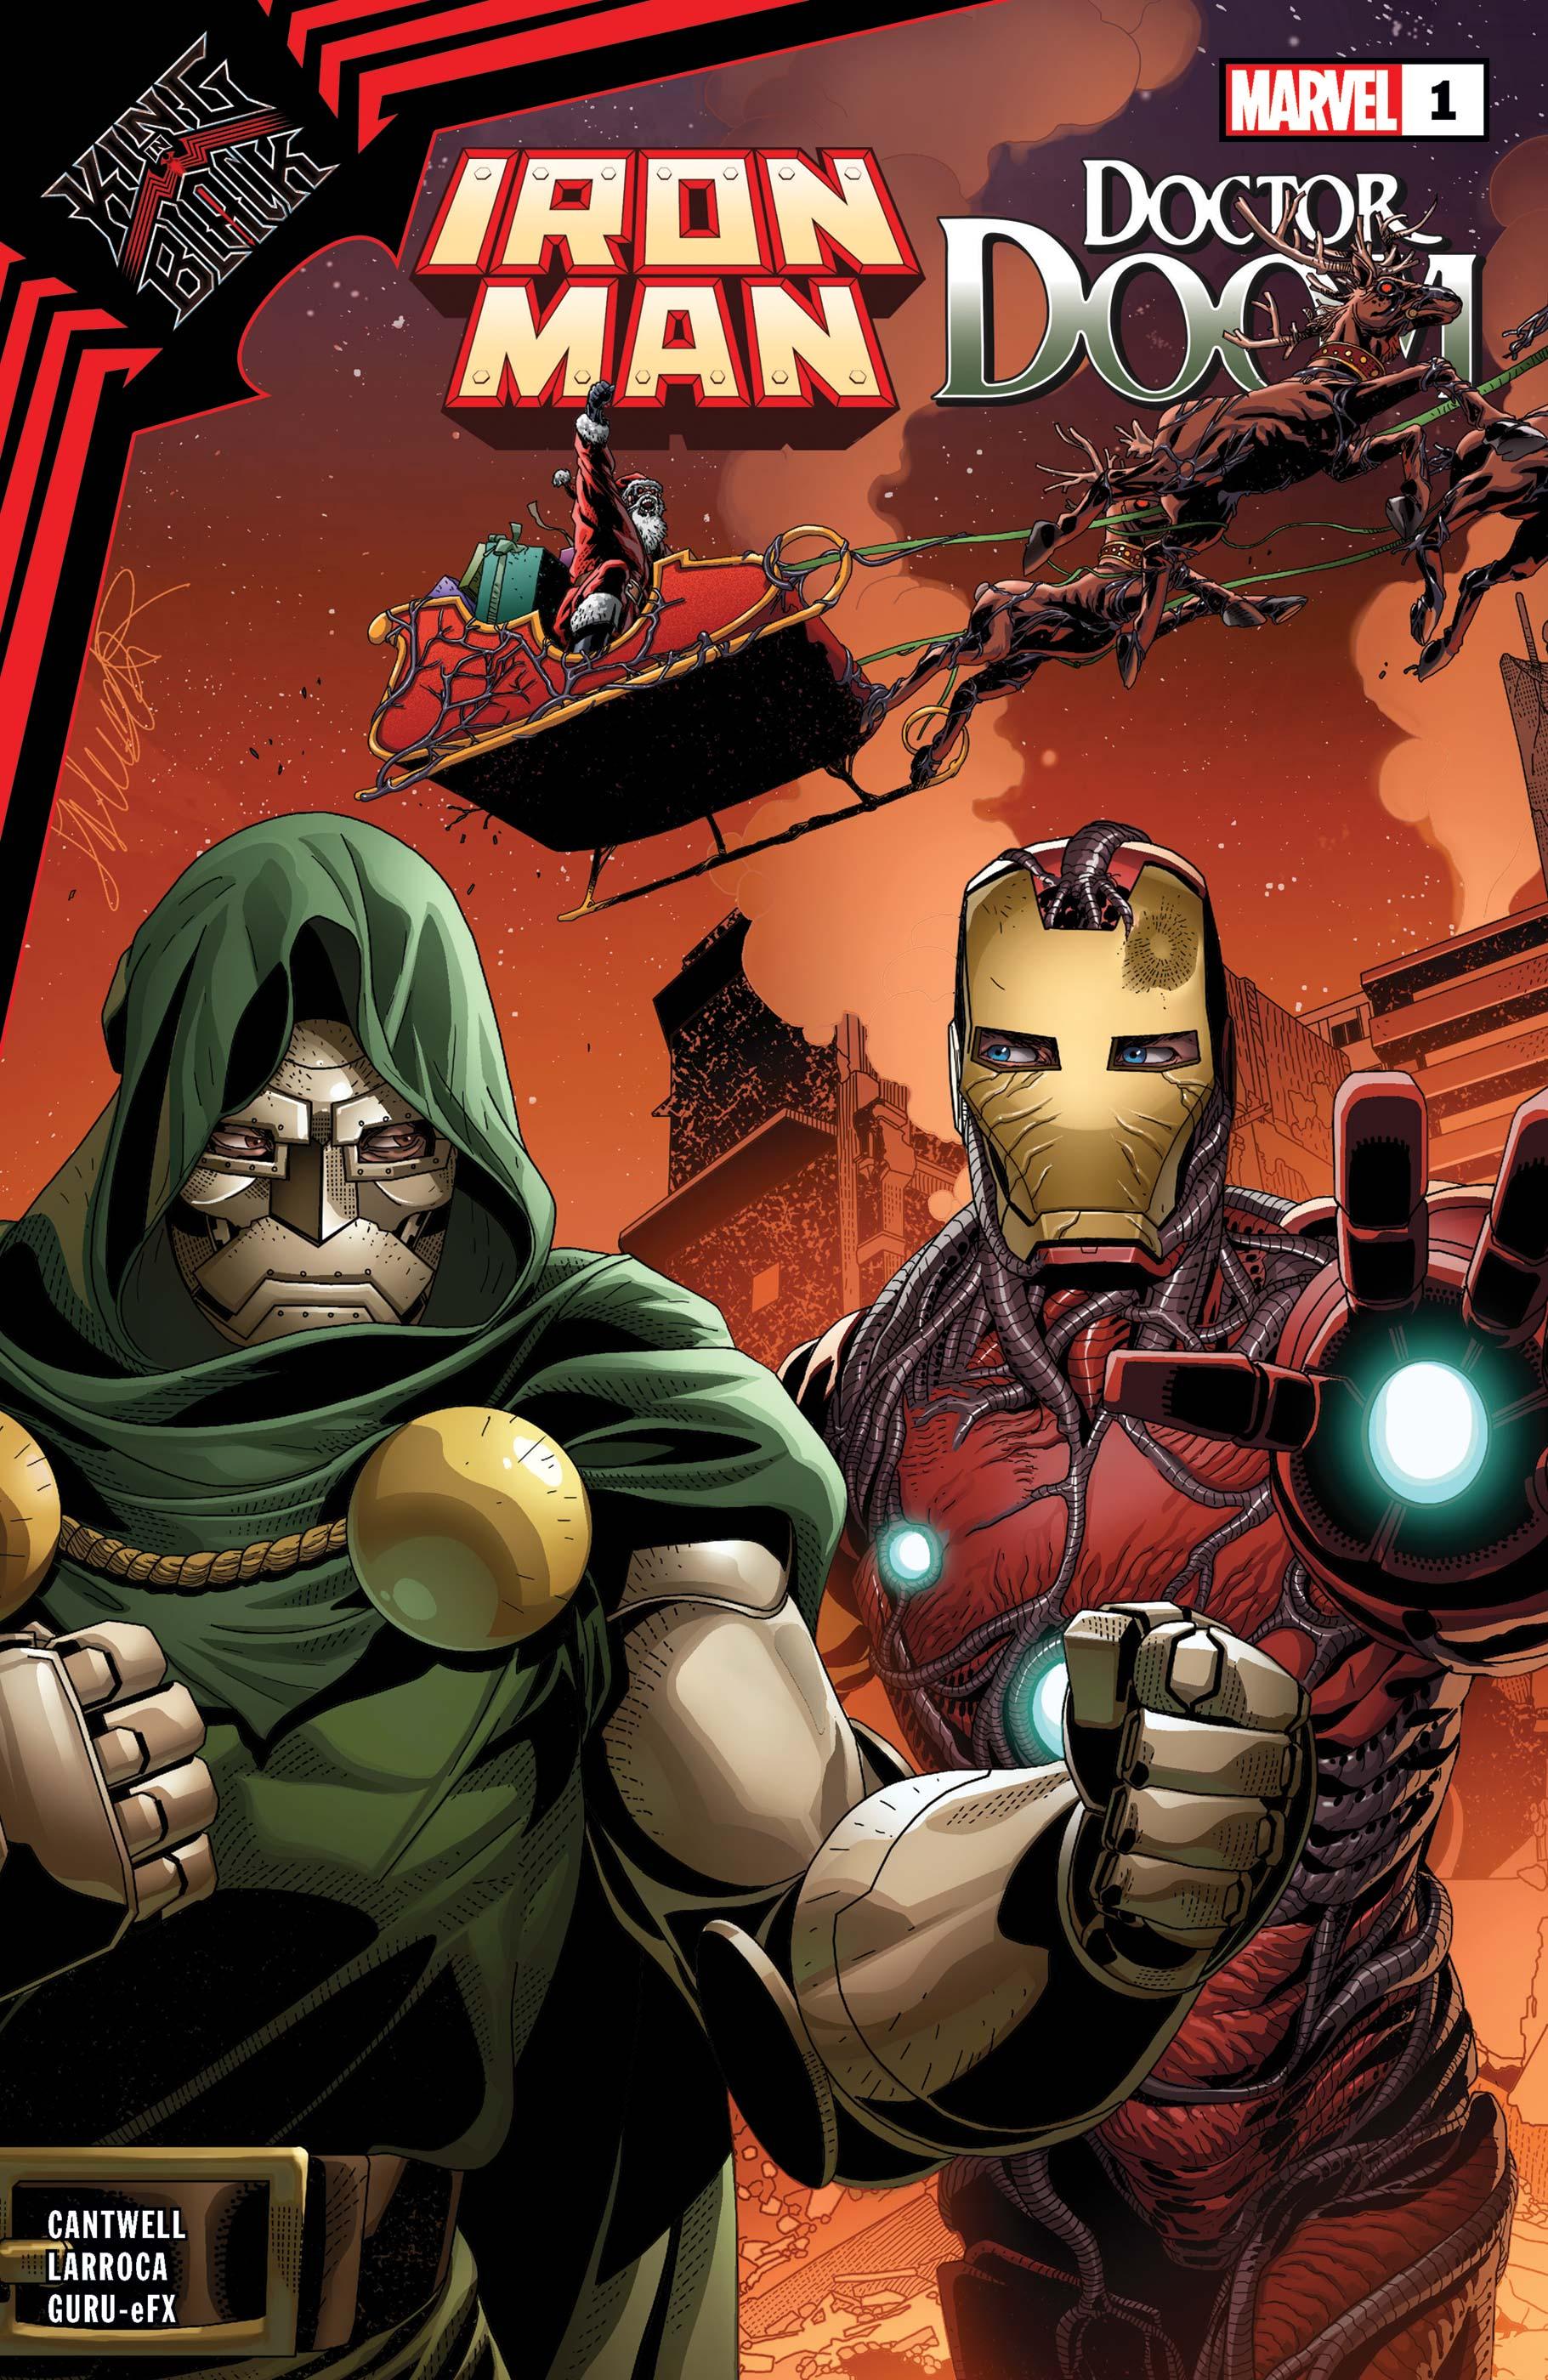 King in Black: Iron Man/Doctor Doom #1 Cover by Salvador Larroca